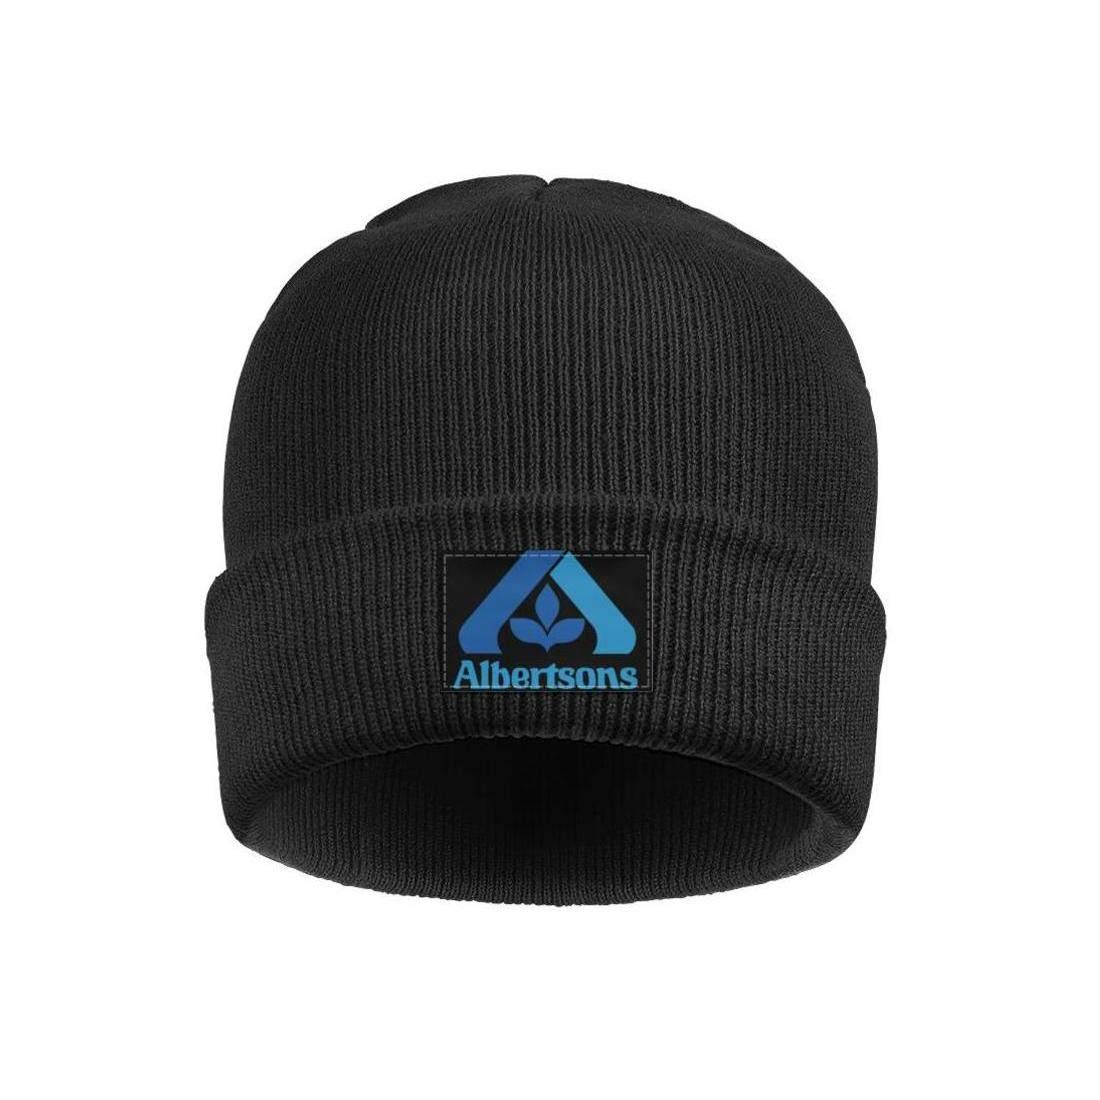 HF12GHFHI Unisex Knit Cap Fine Knit Beanie Skull Hats for Mens Womens Knitting Beanie Hats